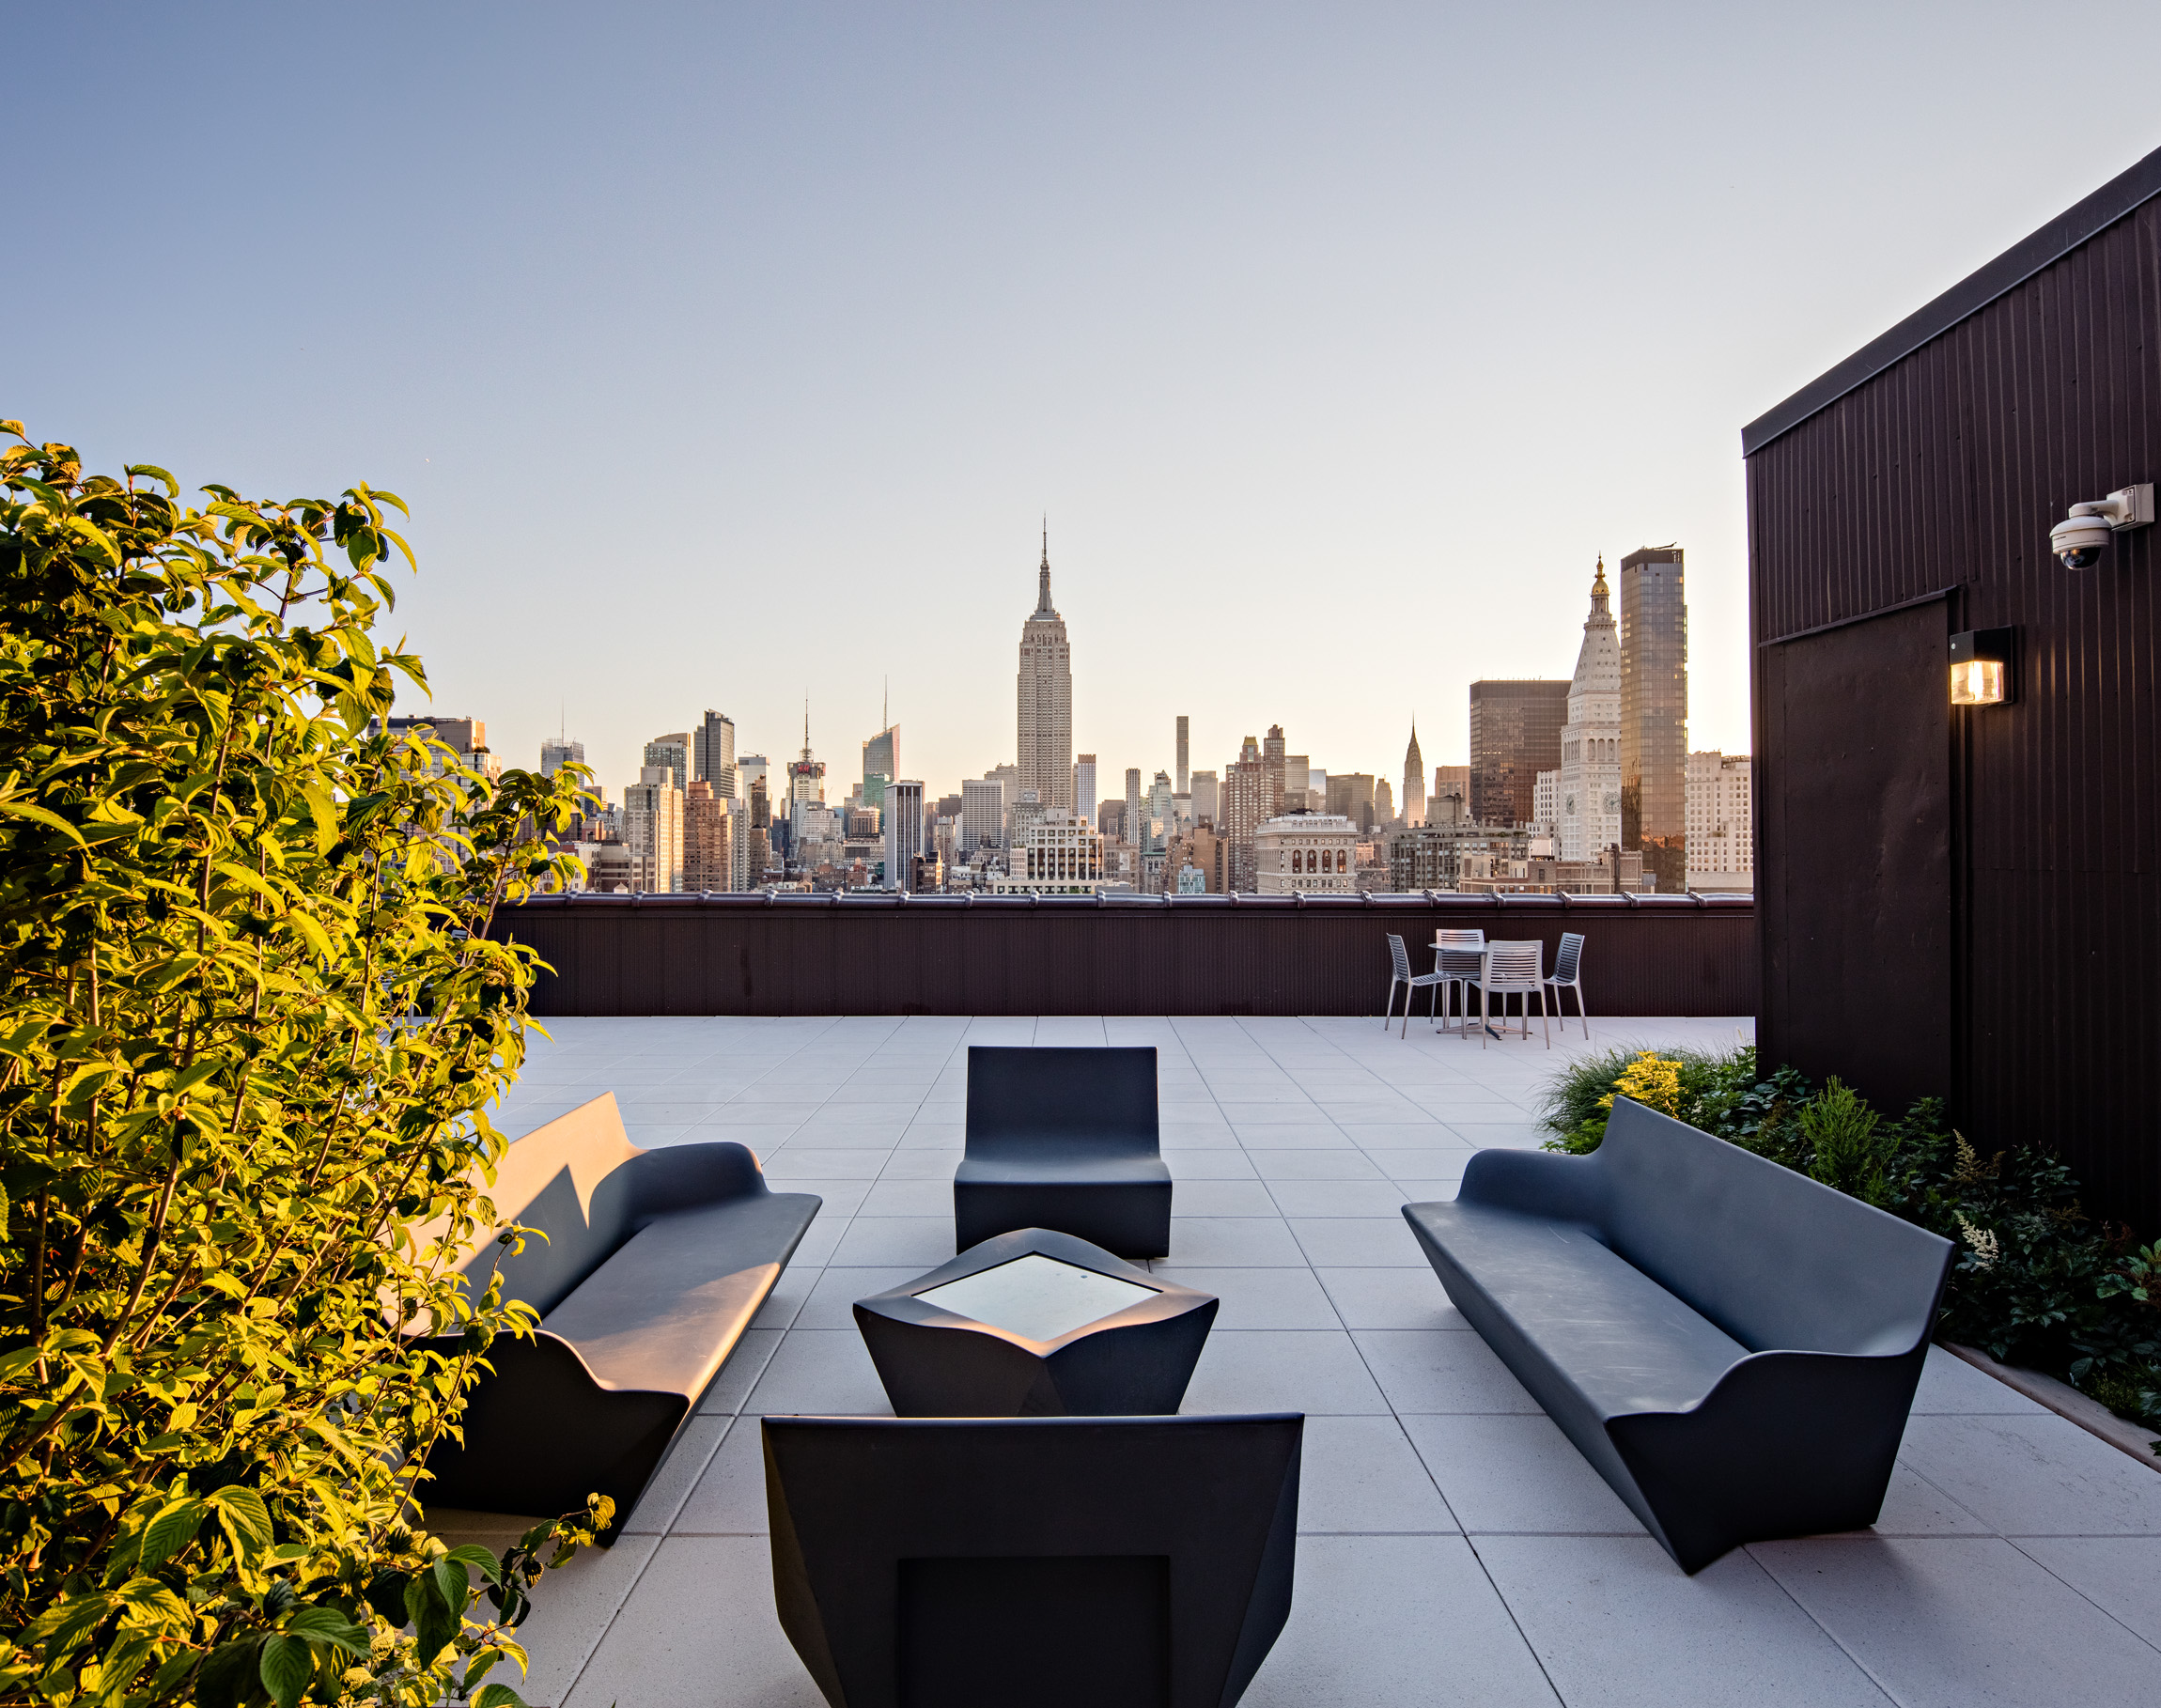 114 Fifth Rooftop-3803-HDR-Edit.jpg